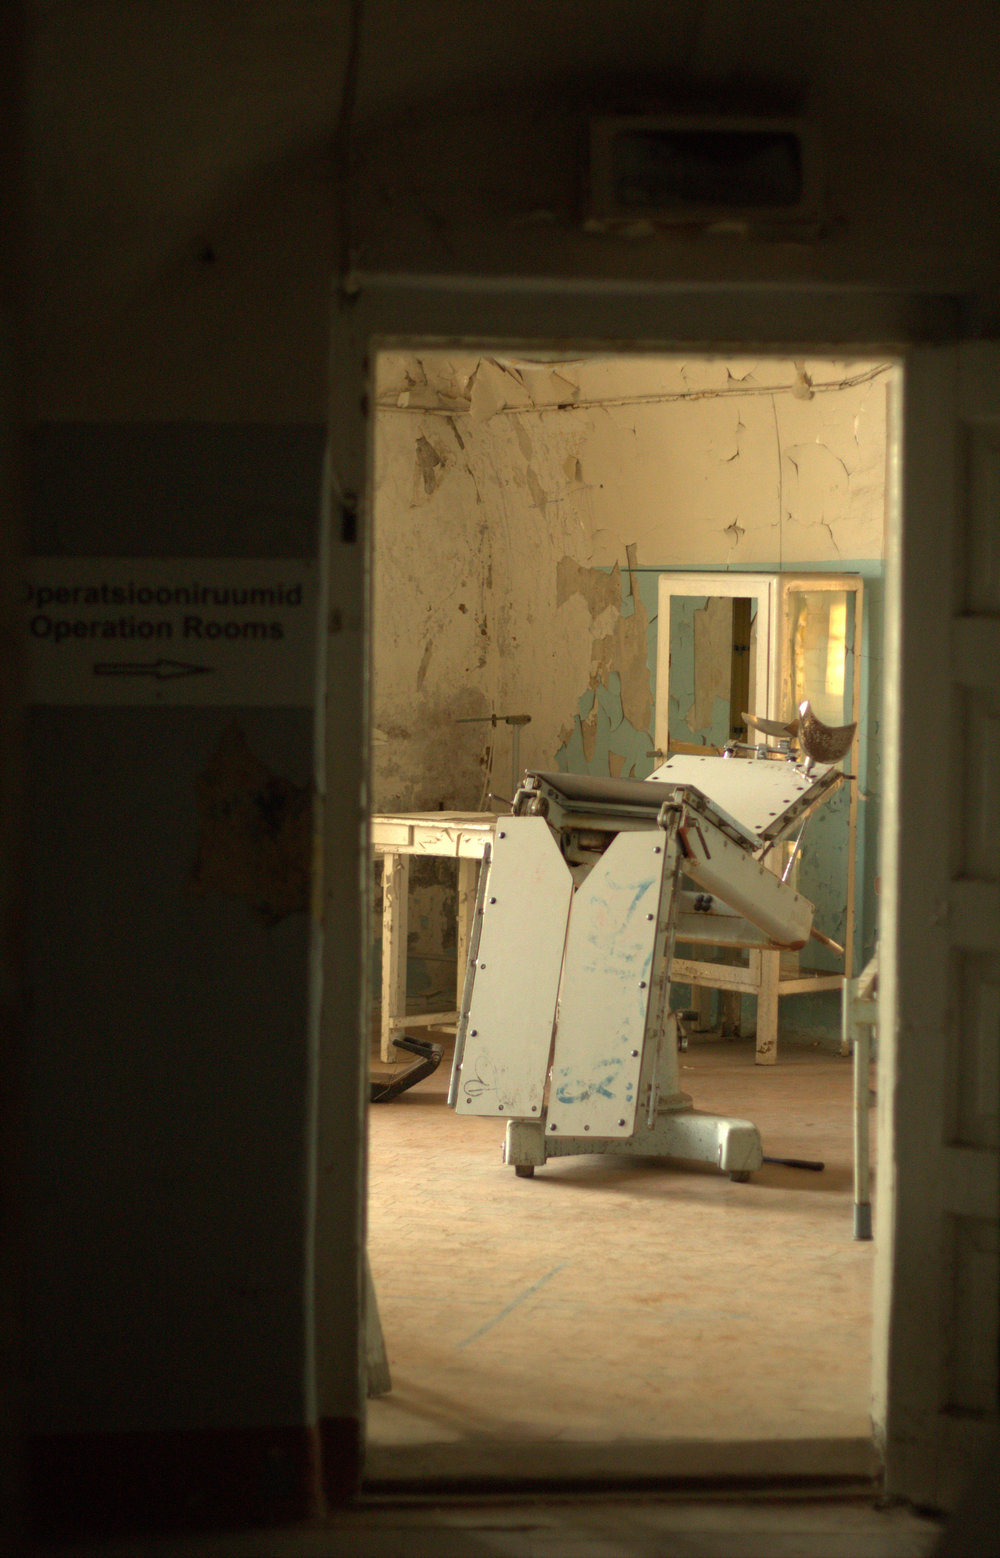 Sillapara realizar estudiosdentales/ginecológicos en la cárcel soviética de Patarei